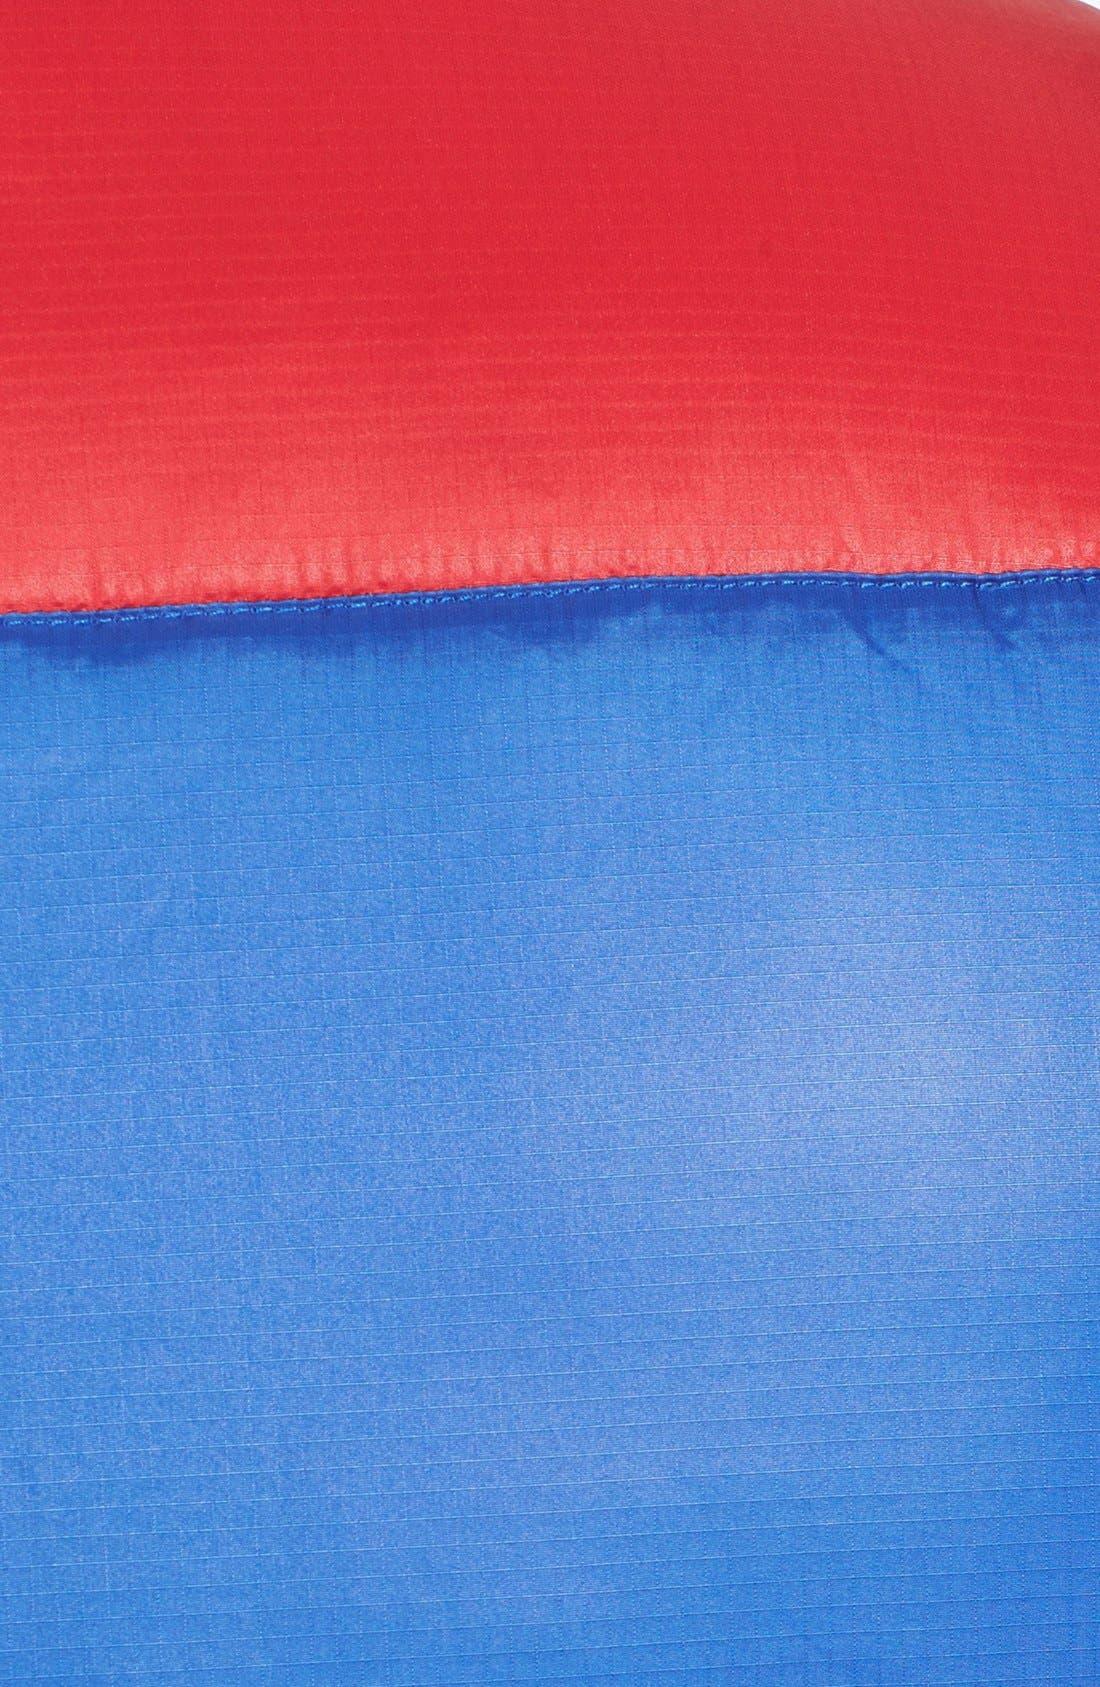 Alternate Image 3  - Mitchell & Ness 'Winning Team - New York Giants' Quilted Vest